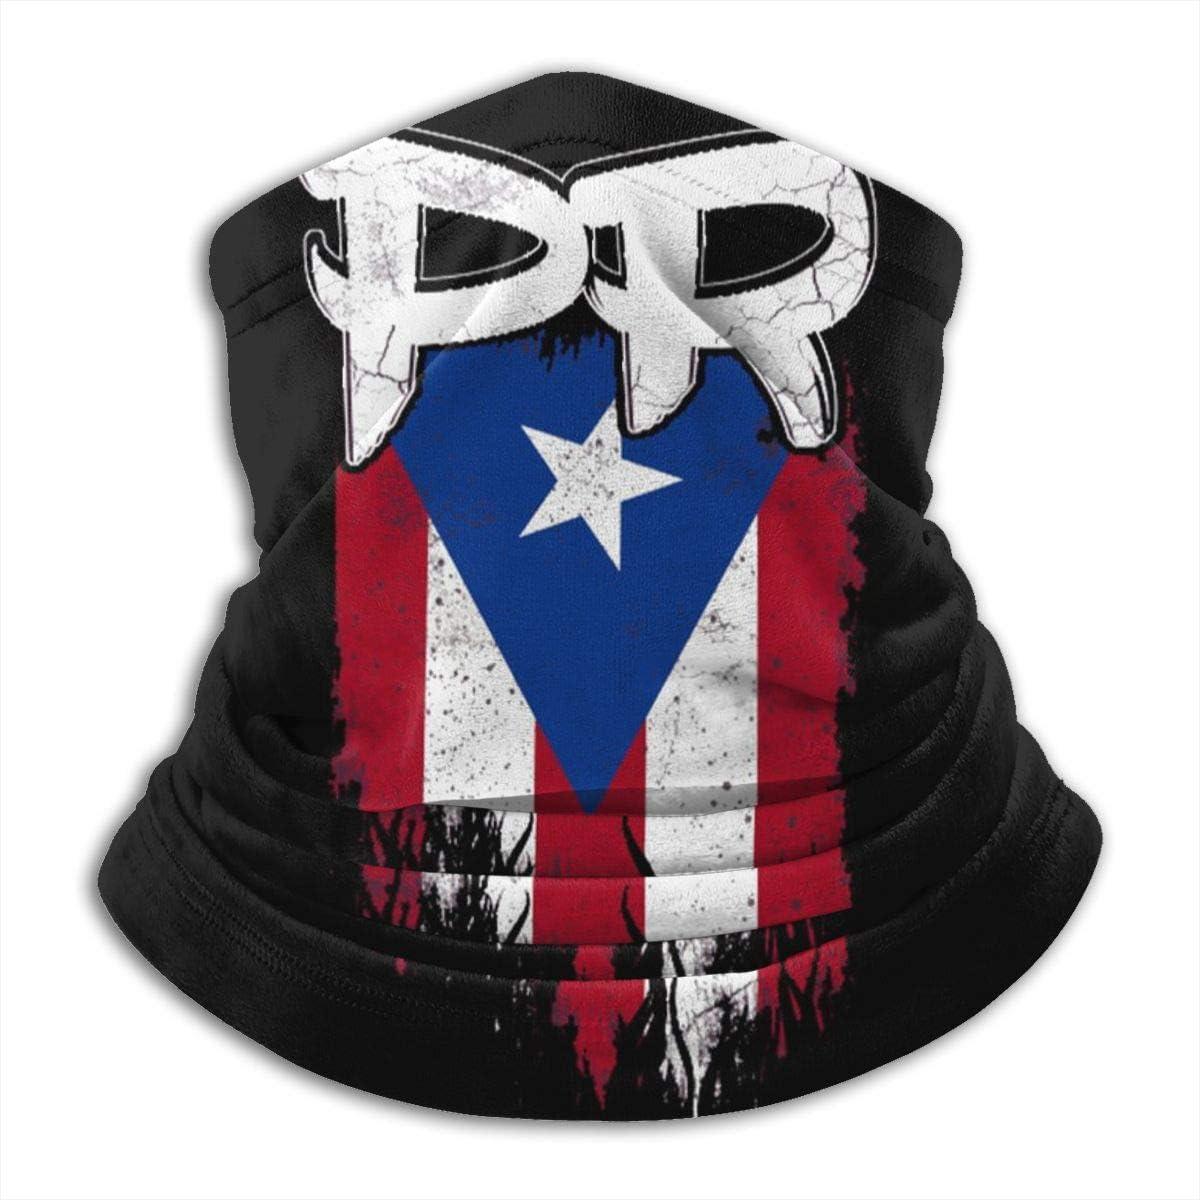 antfeagor Puerto Rico PR Flag Dust Sun Protection Cool Lightweight Windproof Unisex Seamless Rave Bandana Neck Gaiter Tube Headwear Bandana Summer UV Protection Neck Gaiter Face Scarf Mask